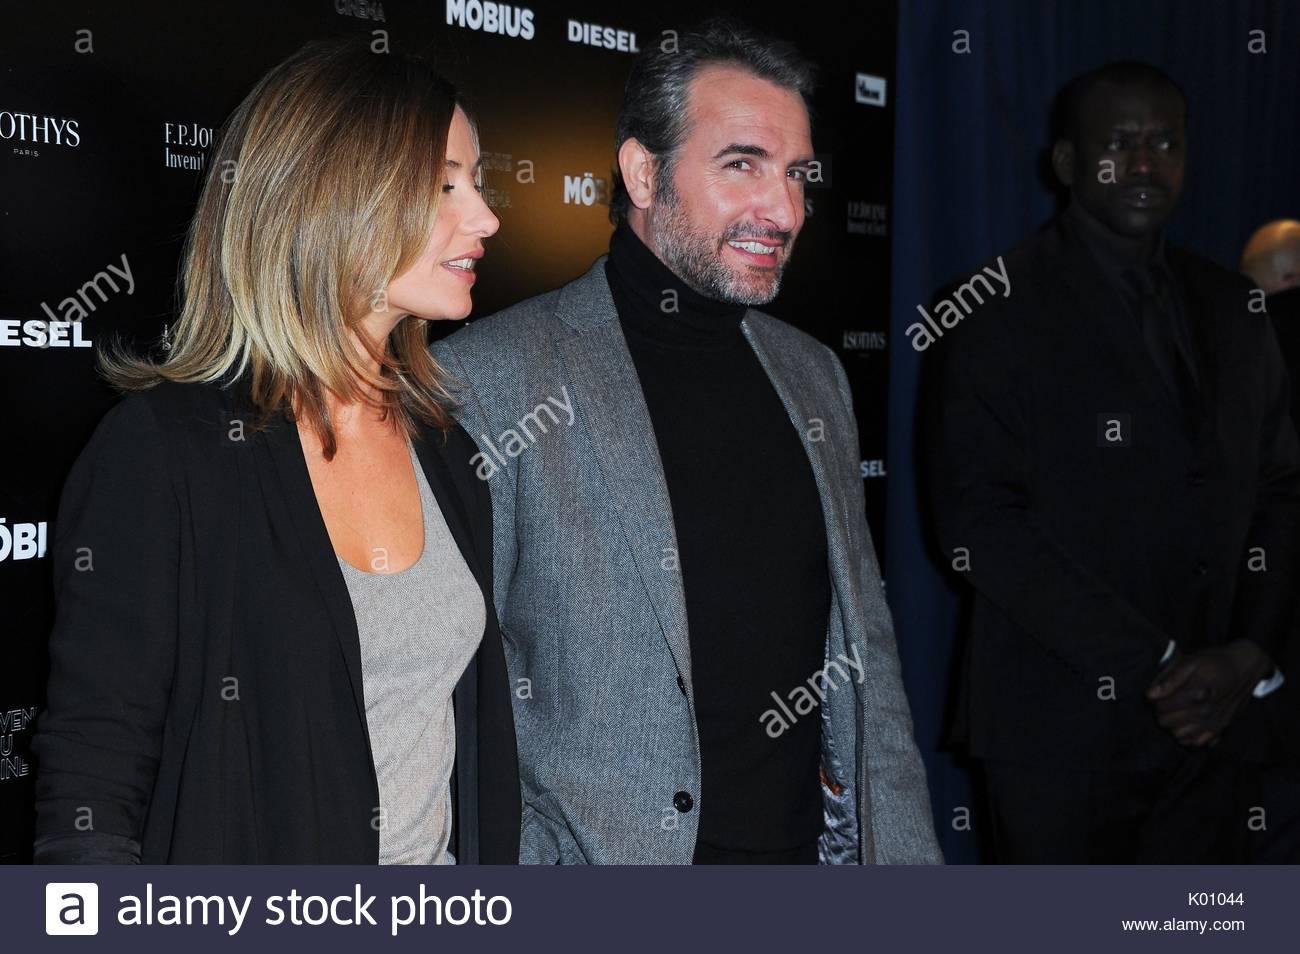 Jean dujardin and cecile de france stock photos jean for Dujardin france